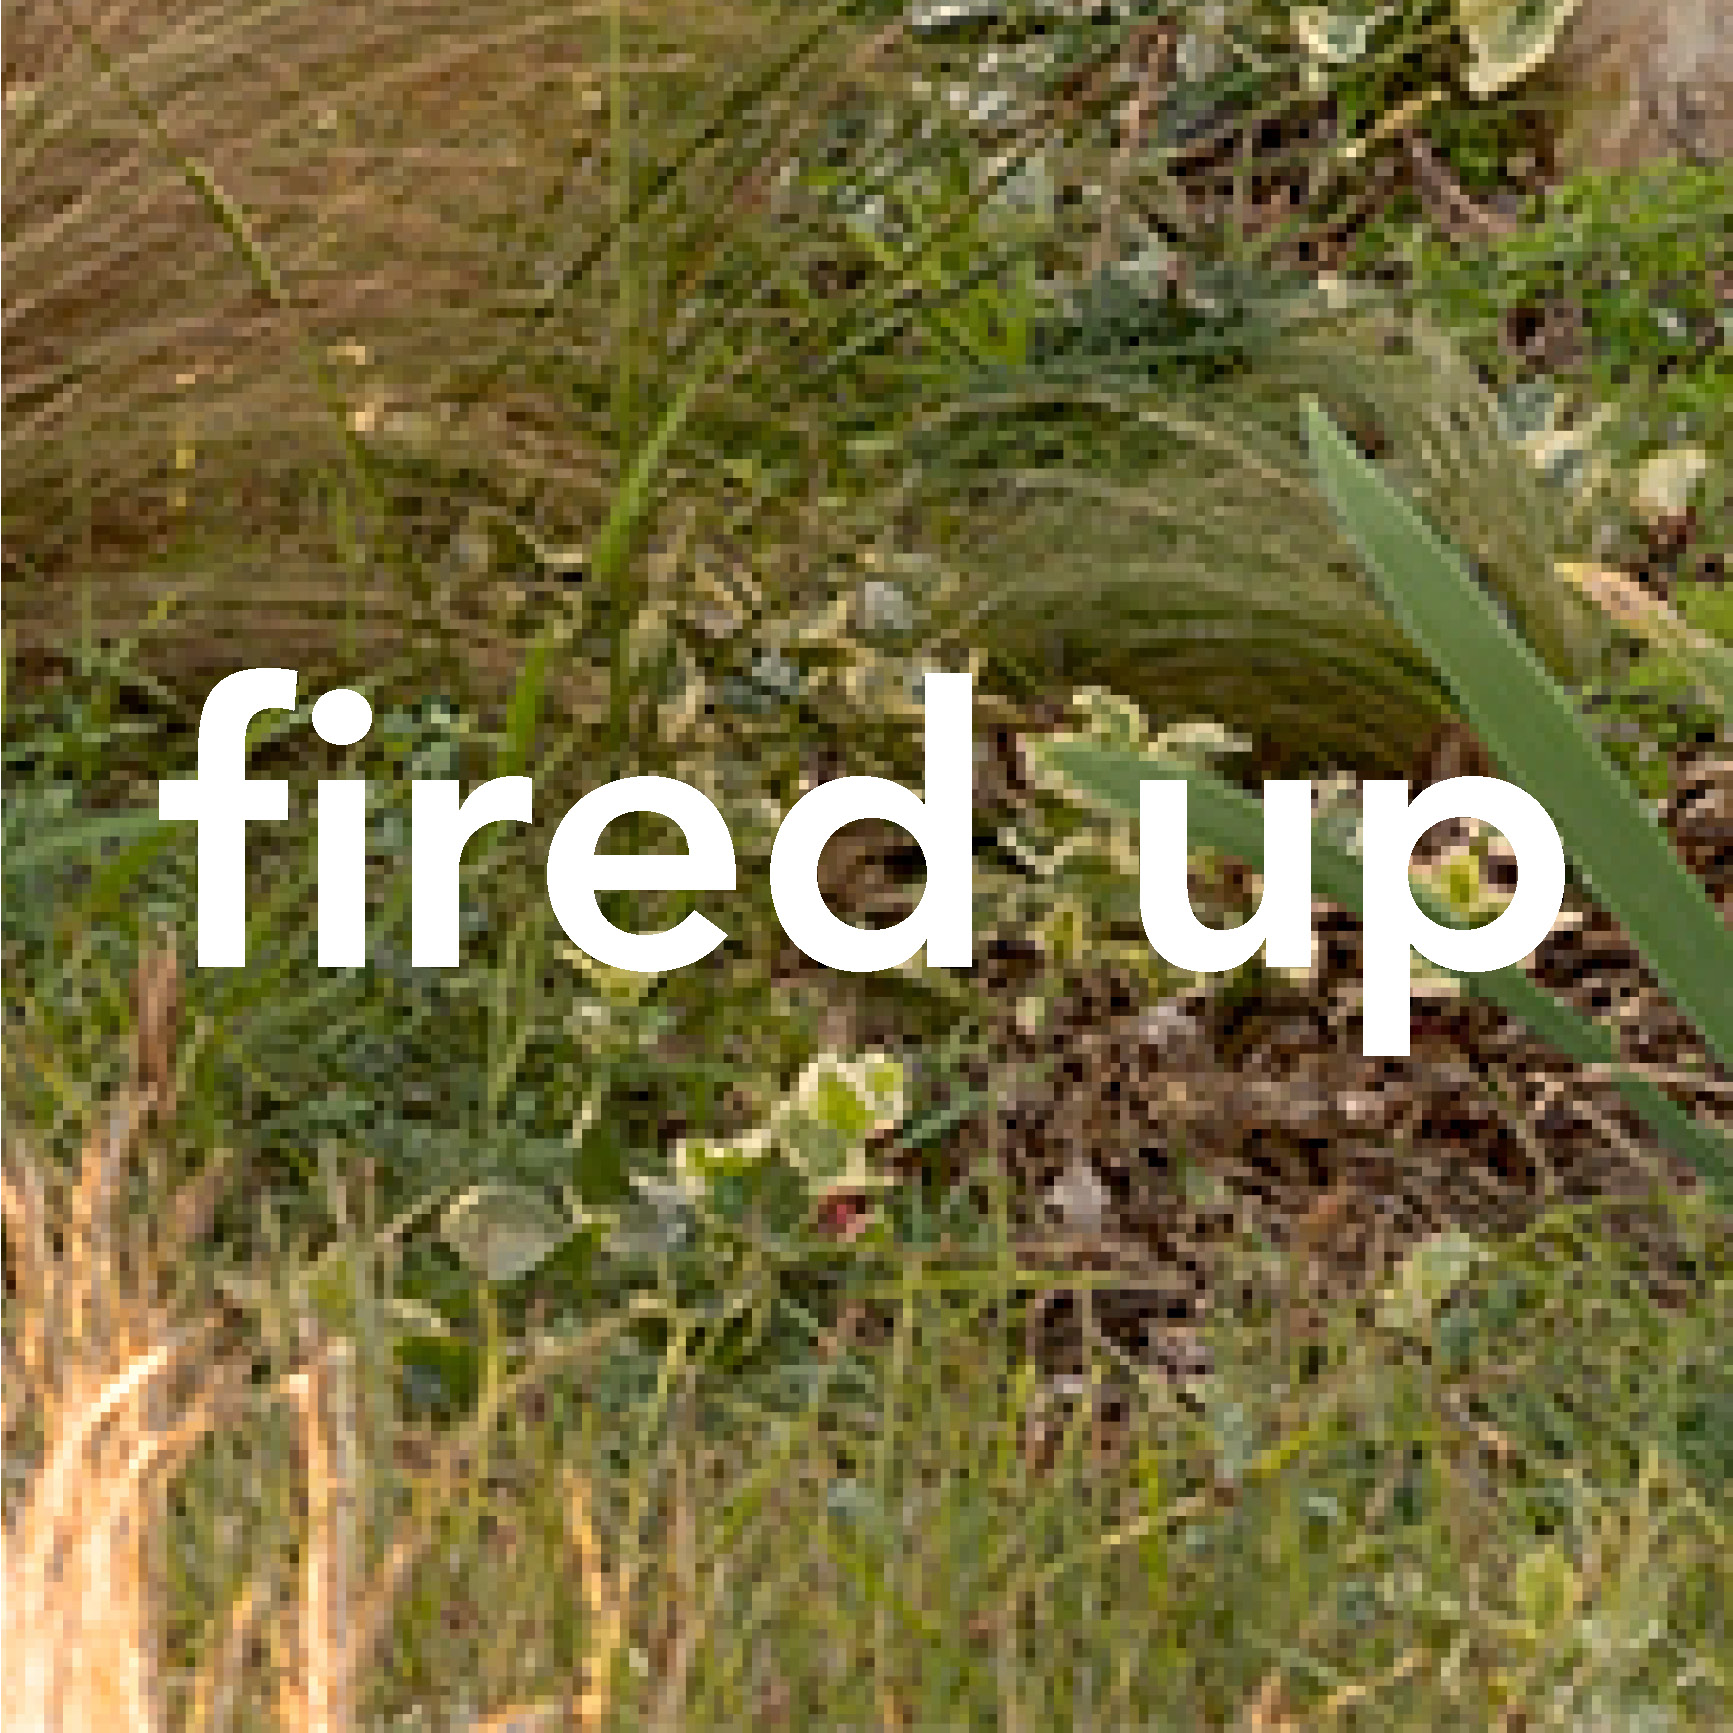 fired up woodshed recording studio malibu ca